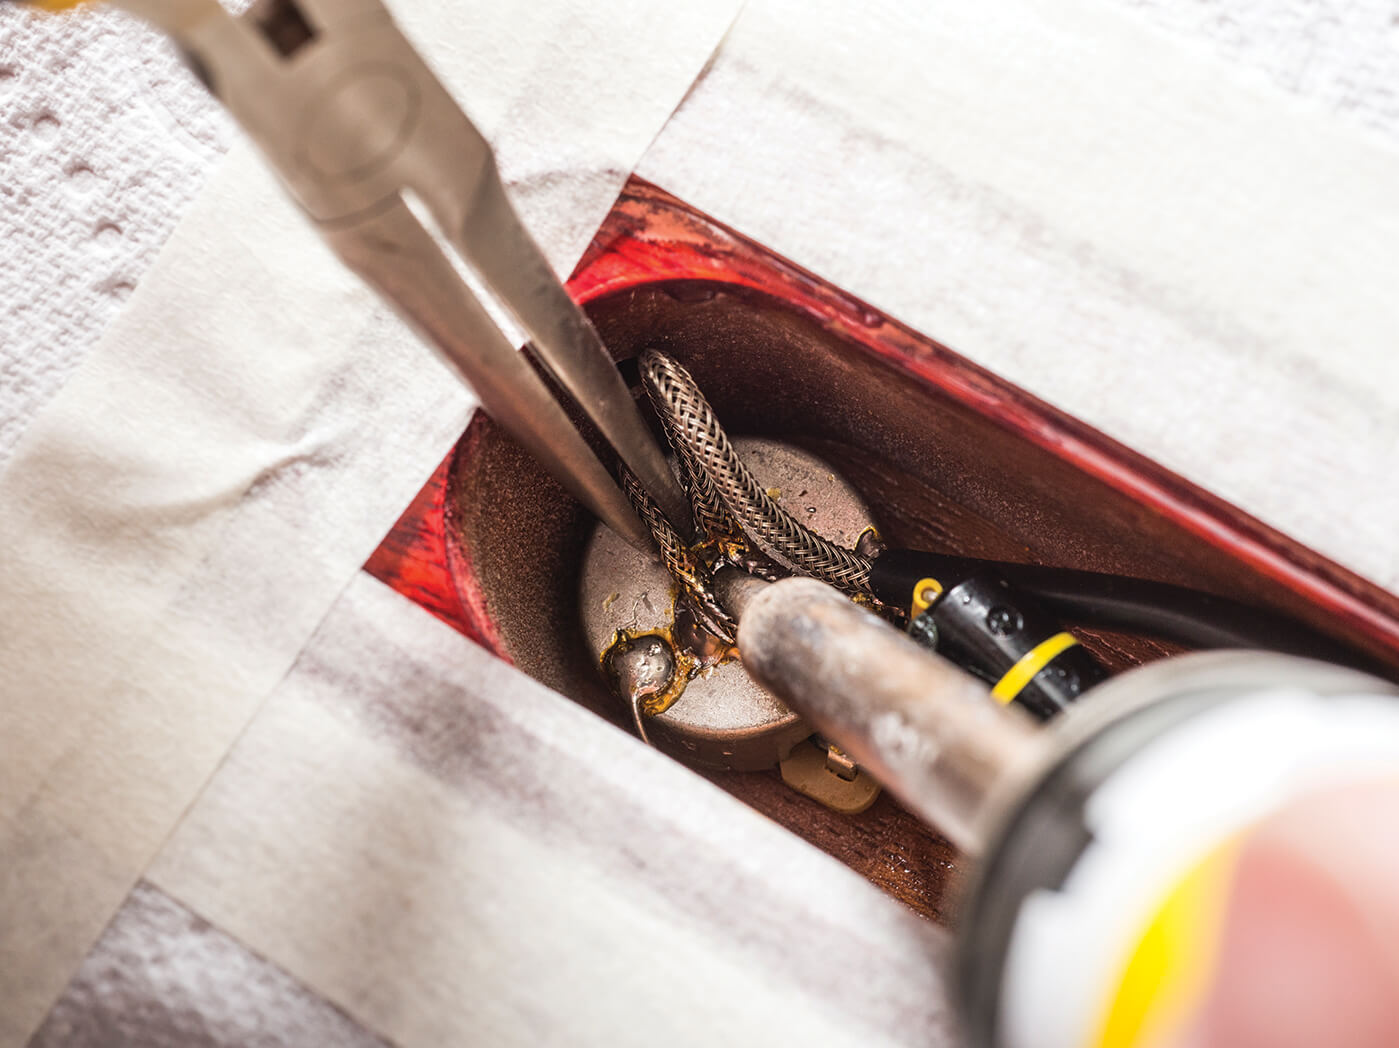 DIY Handbook replacing pickup shield wire